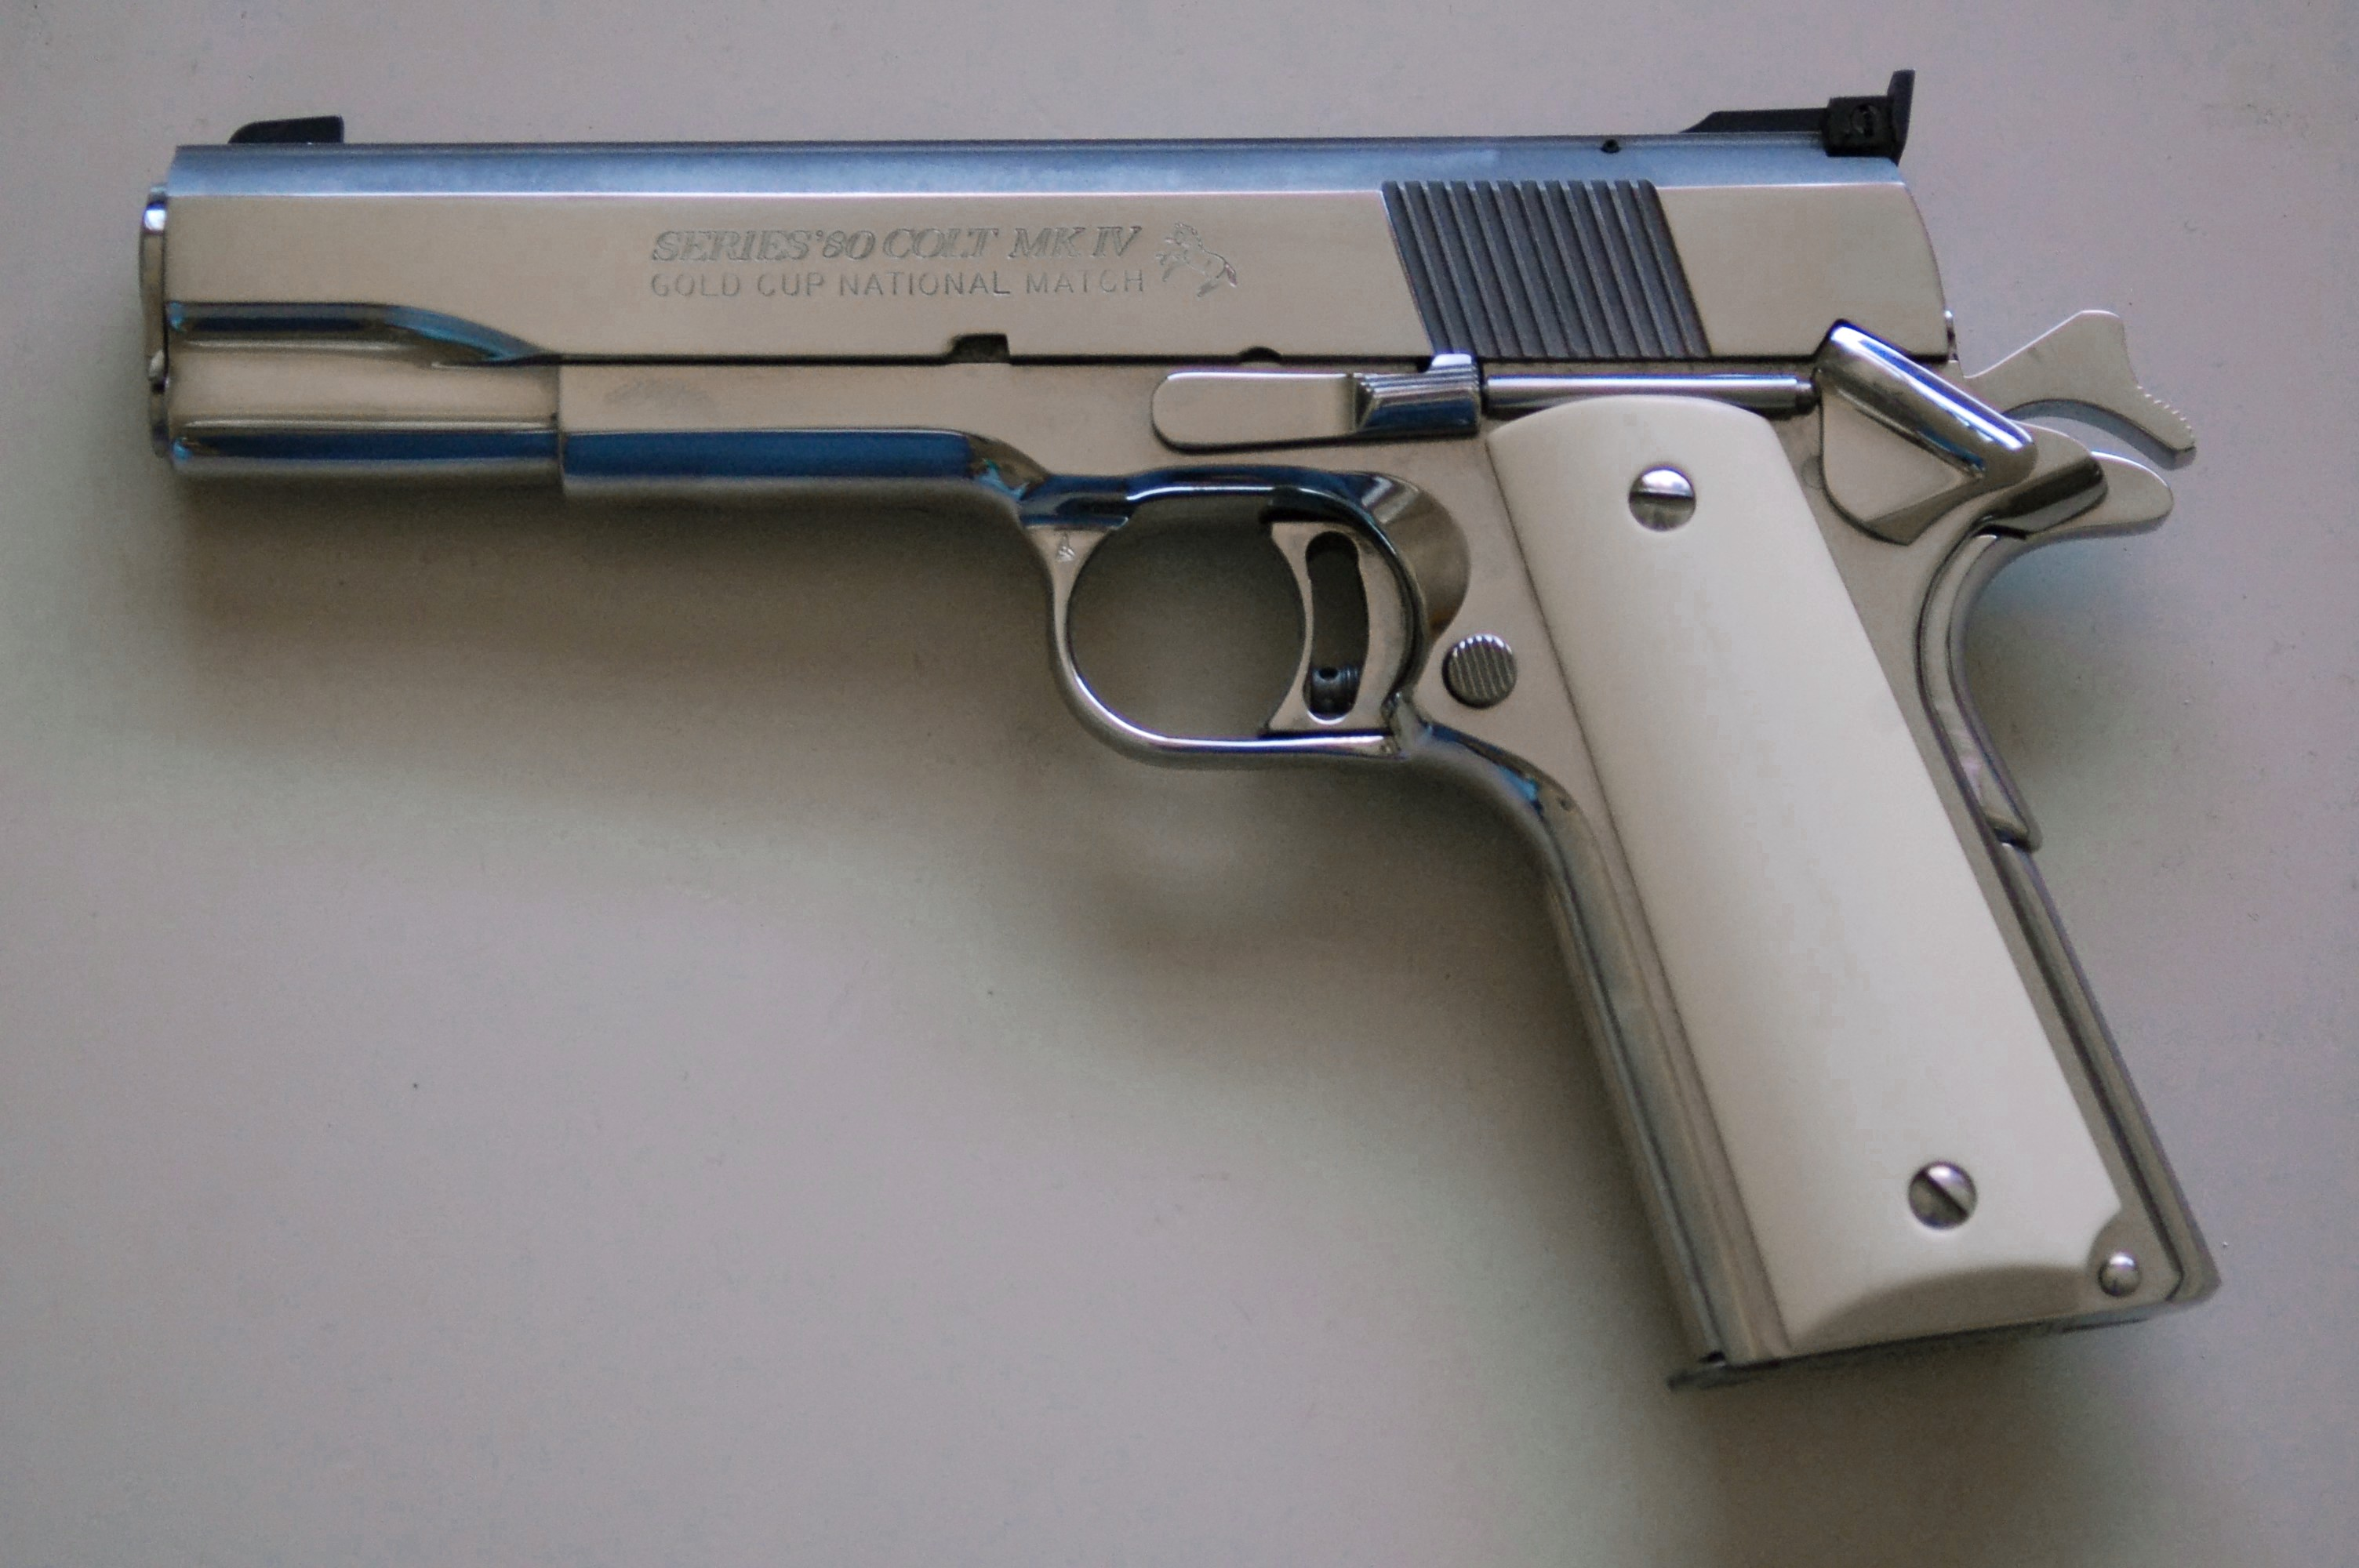 Variedades de armas de fuego (info) megapost - Info - Taringa!